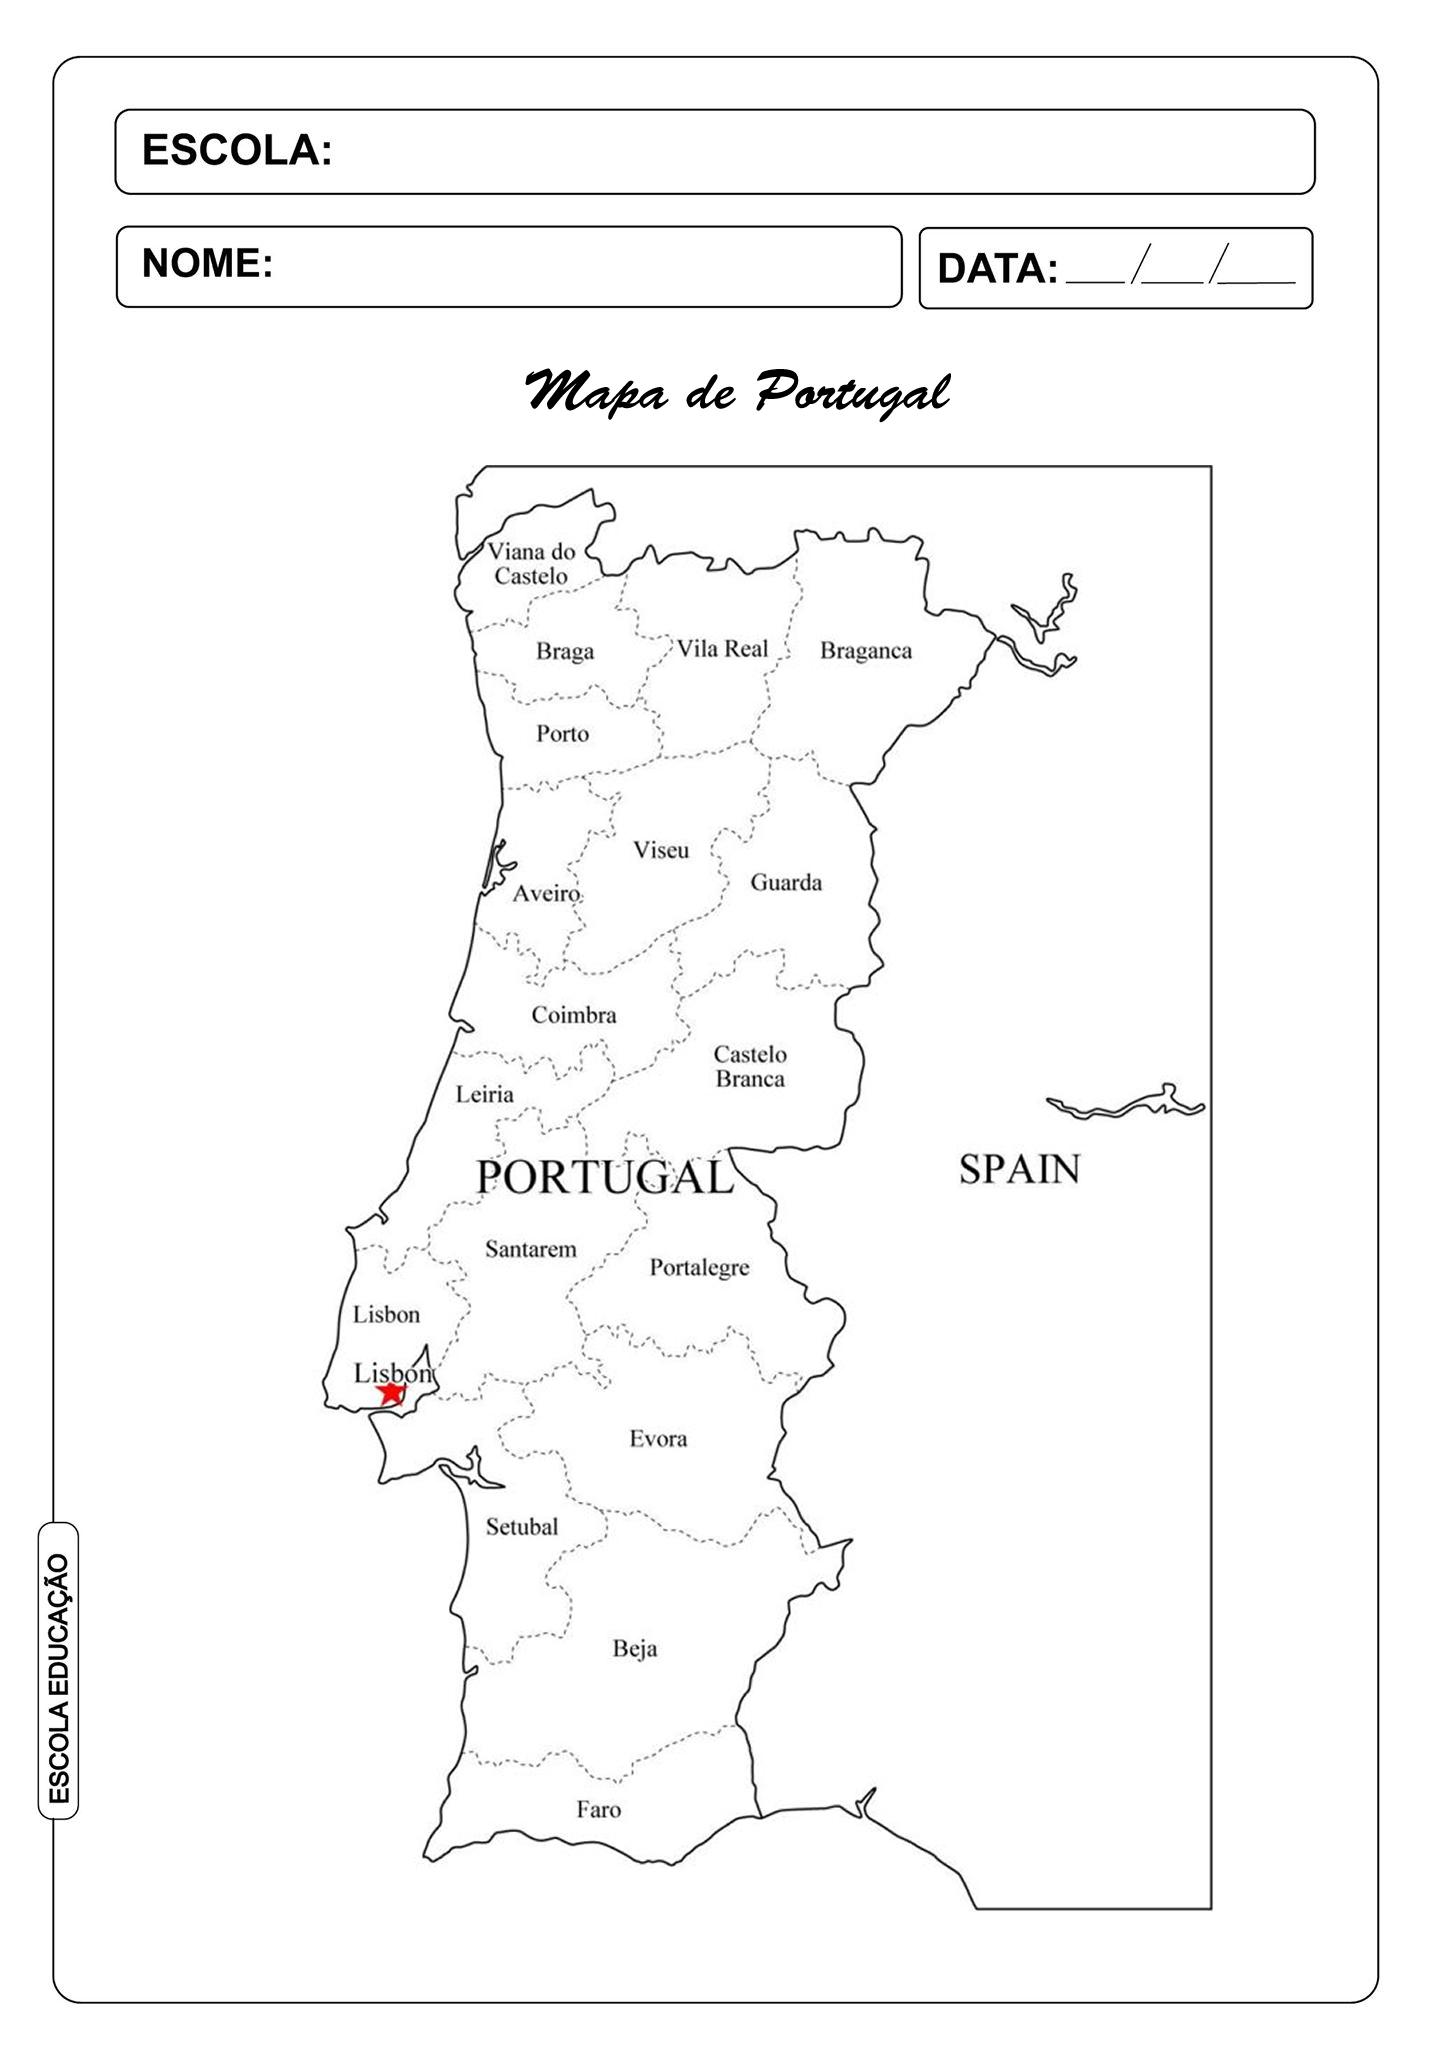 Mapa De Portugal Para Imprimir E Colorir Escola Educacao